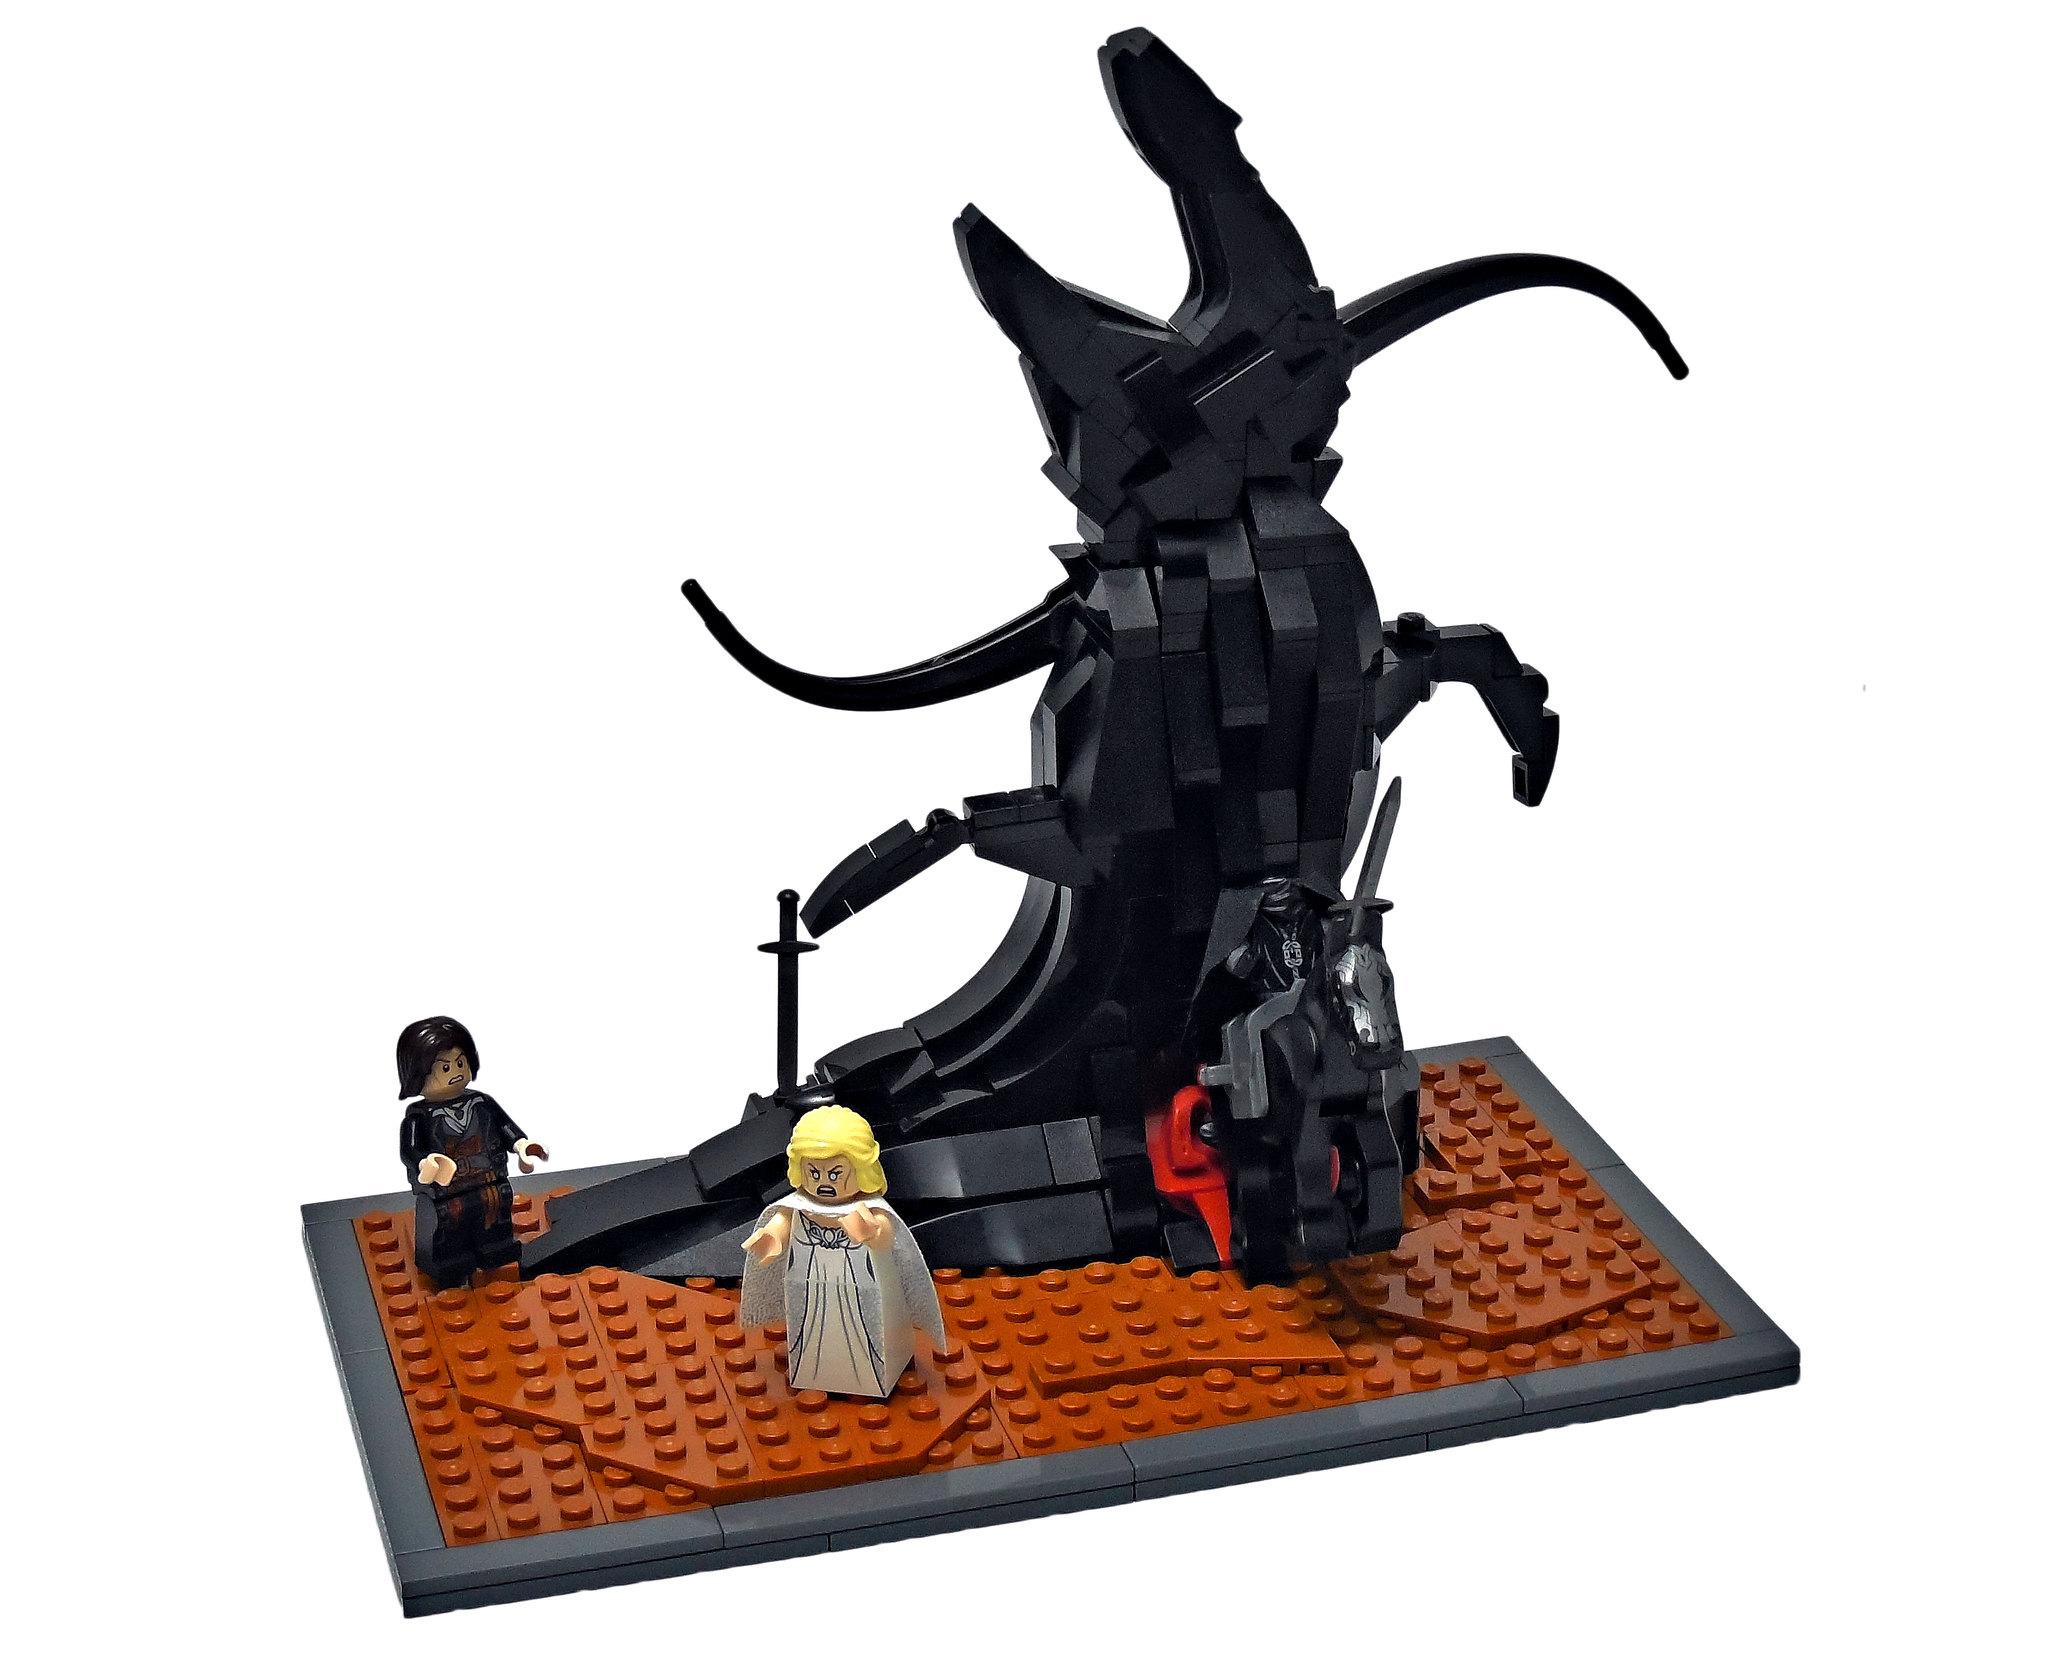 LEGO® MOC by Vitreolum: Sleepy Hollow (1999)